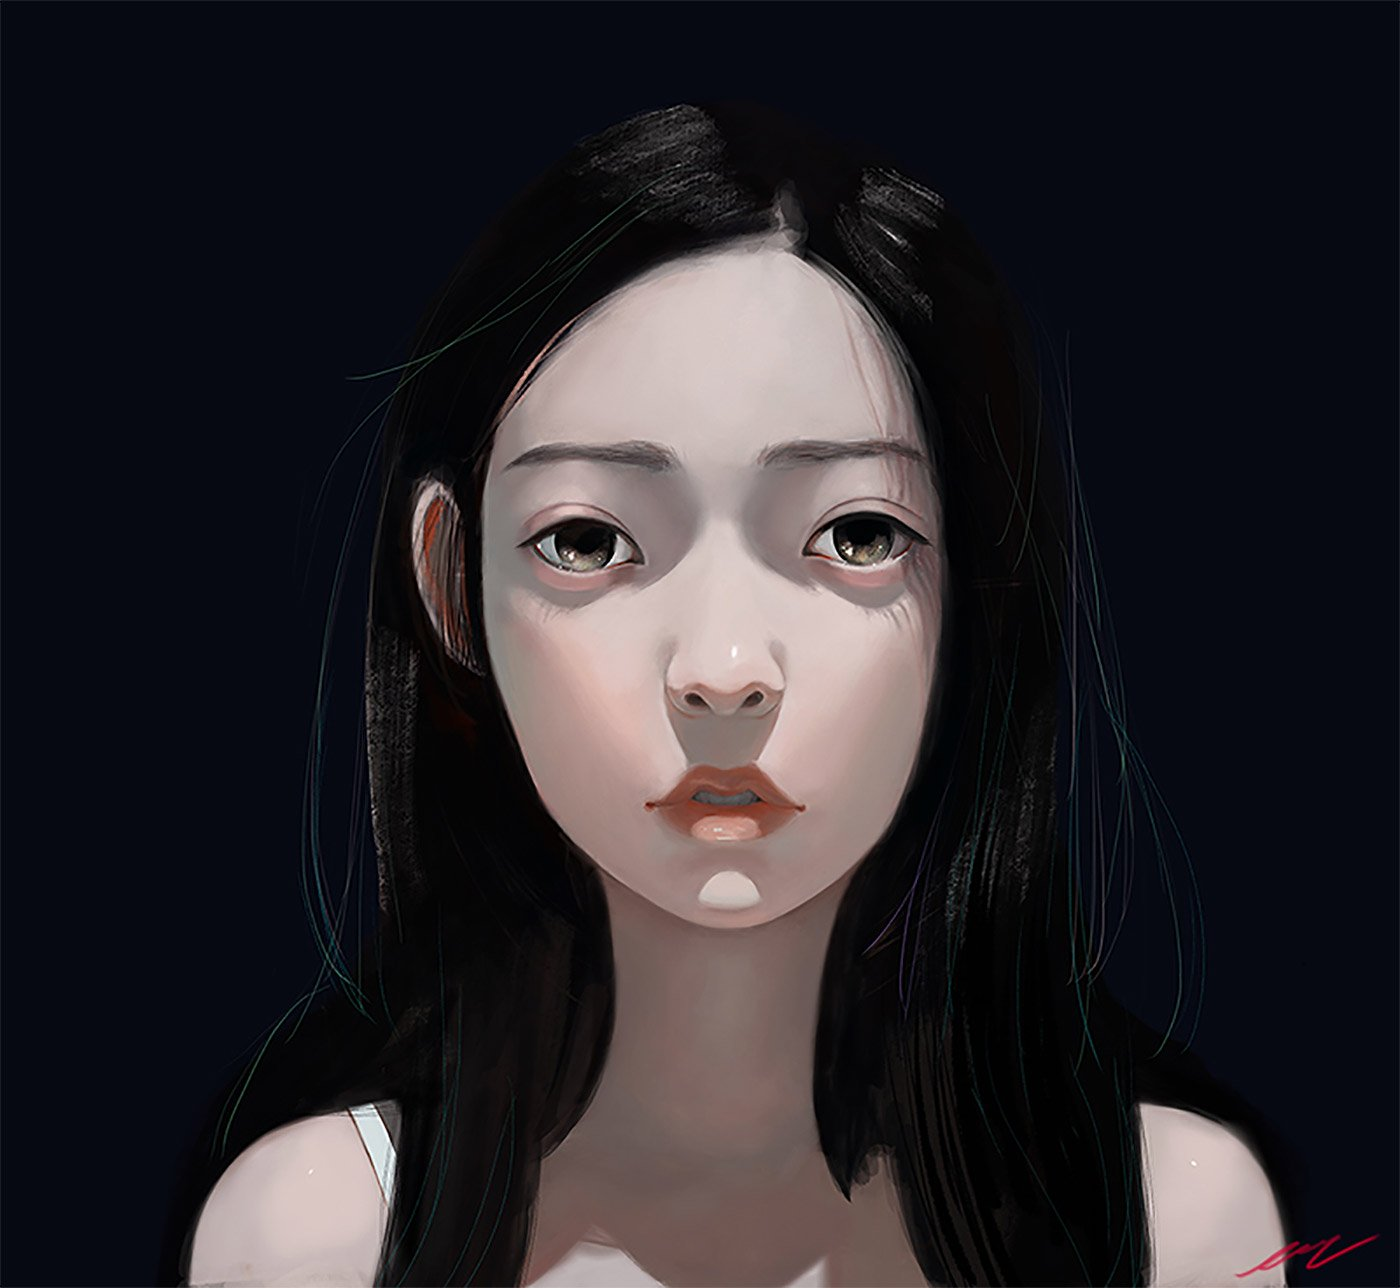 Joanne Nam冷艳忧郁的人物插画作品